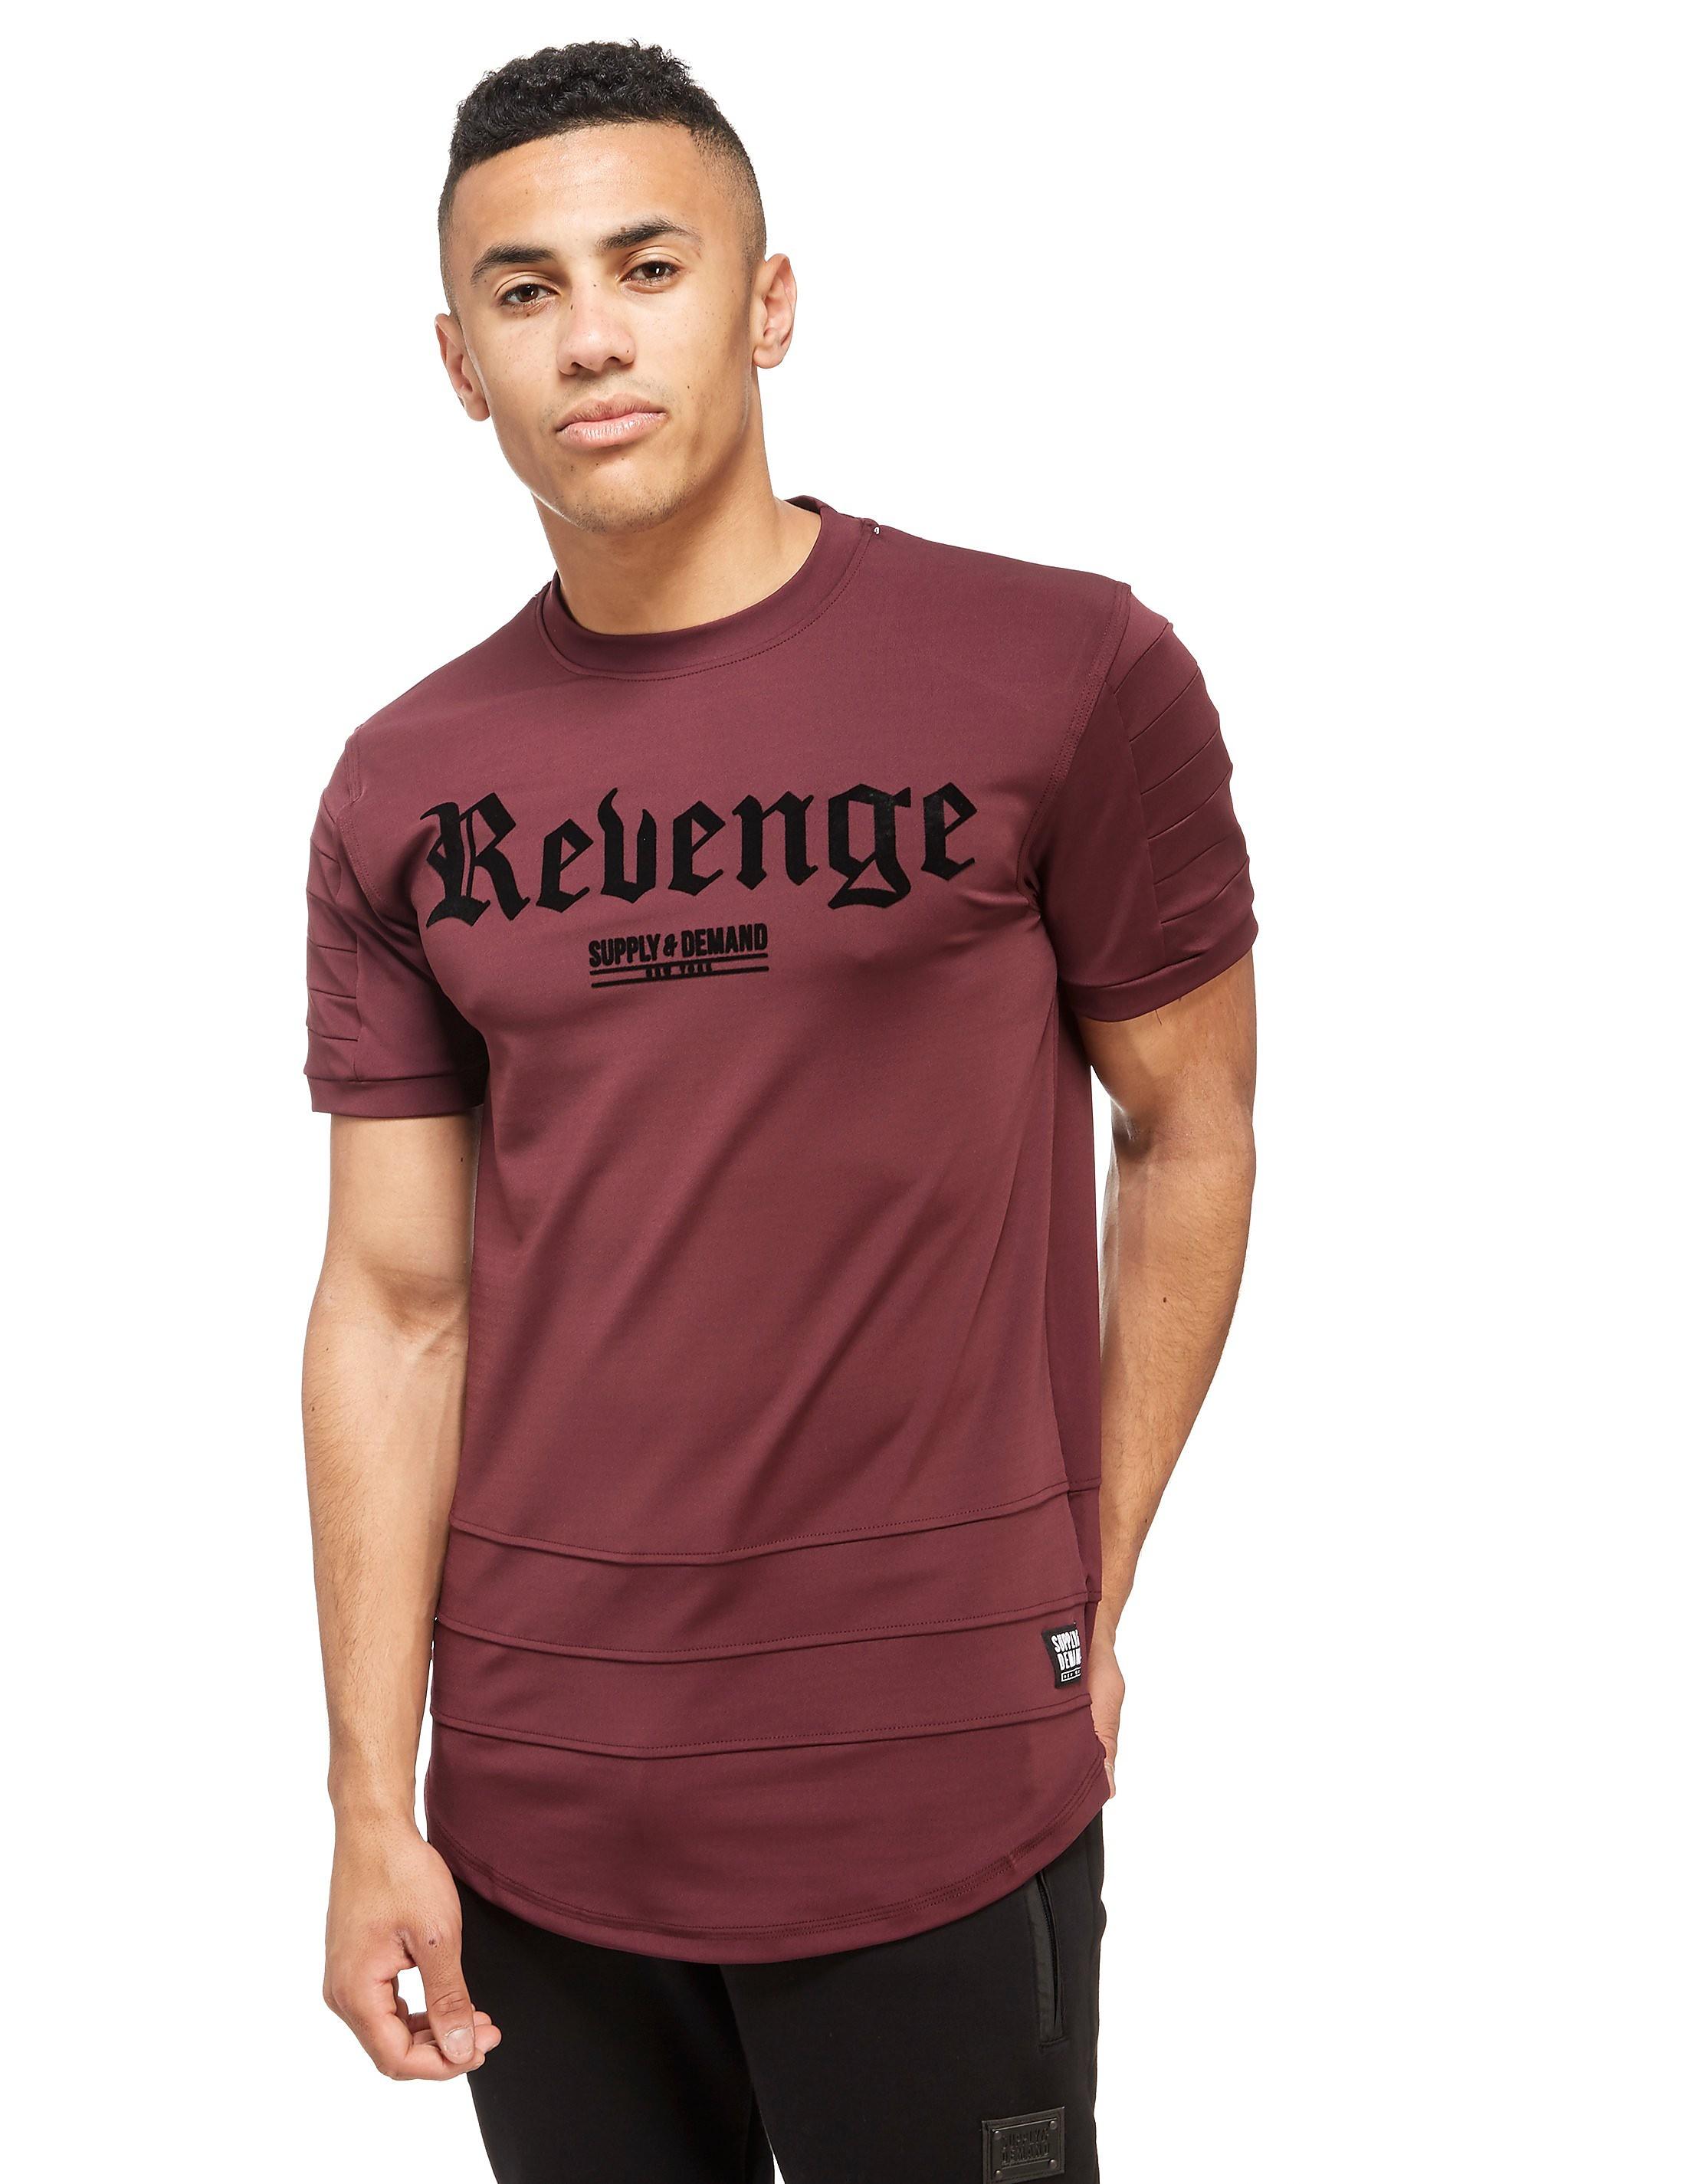 Supply & Demand Gothic Revenge T-Shirt